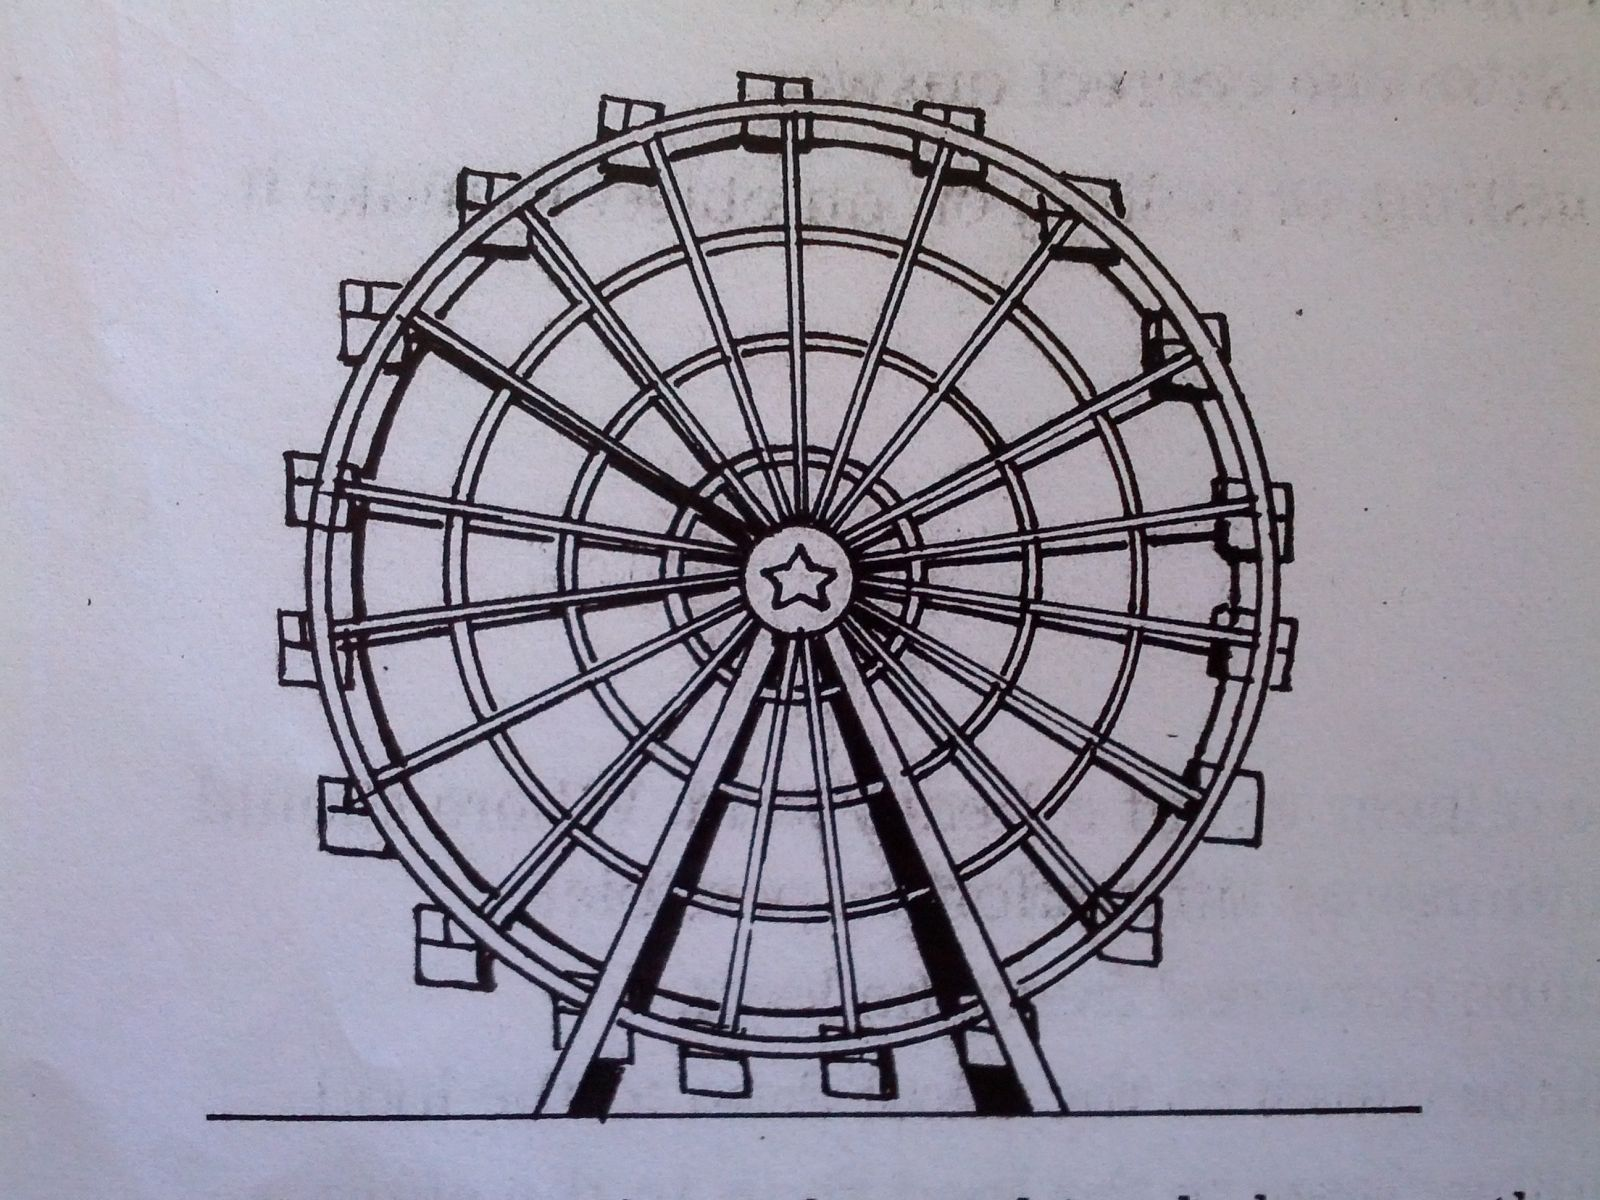 Simple Machines Technology Quiz